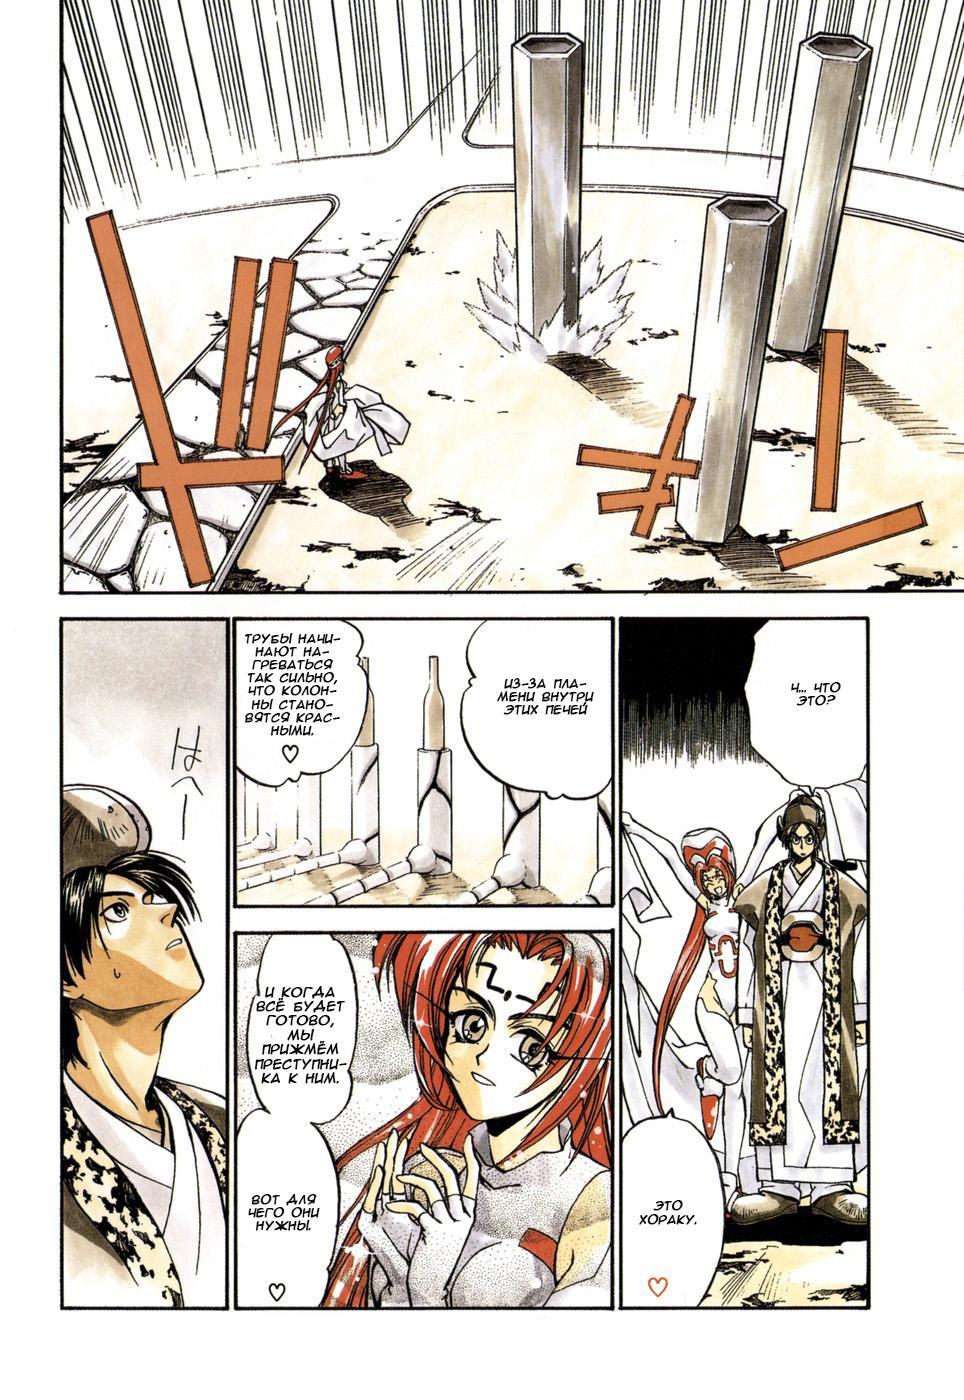 https://r1.ninemanga.com/comics/pic2/22/33366/344548/1512250168573.jpg Page 6